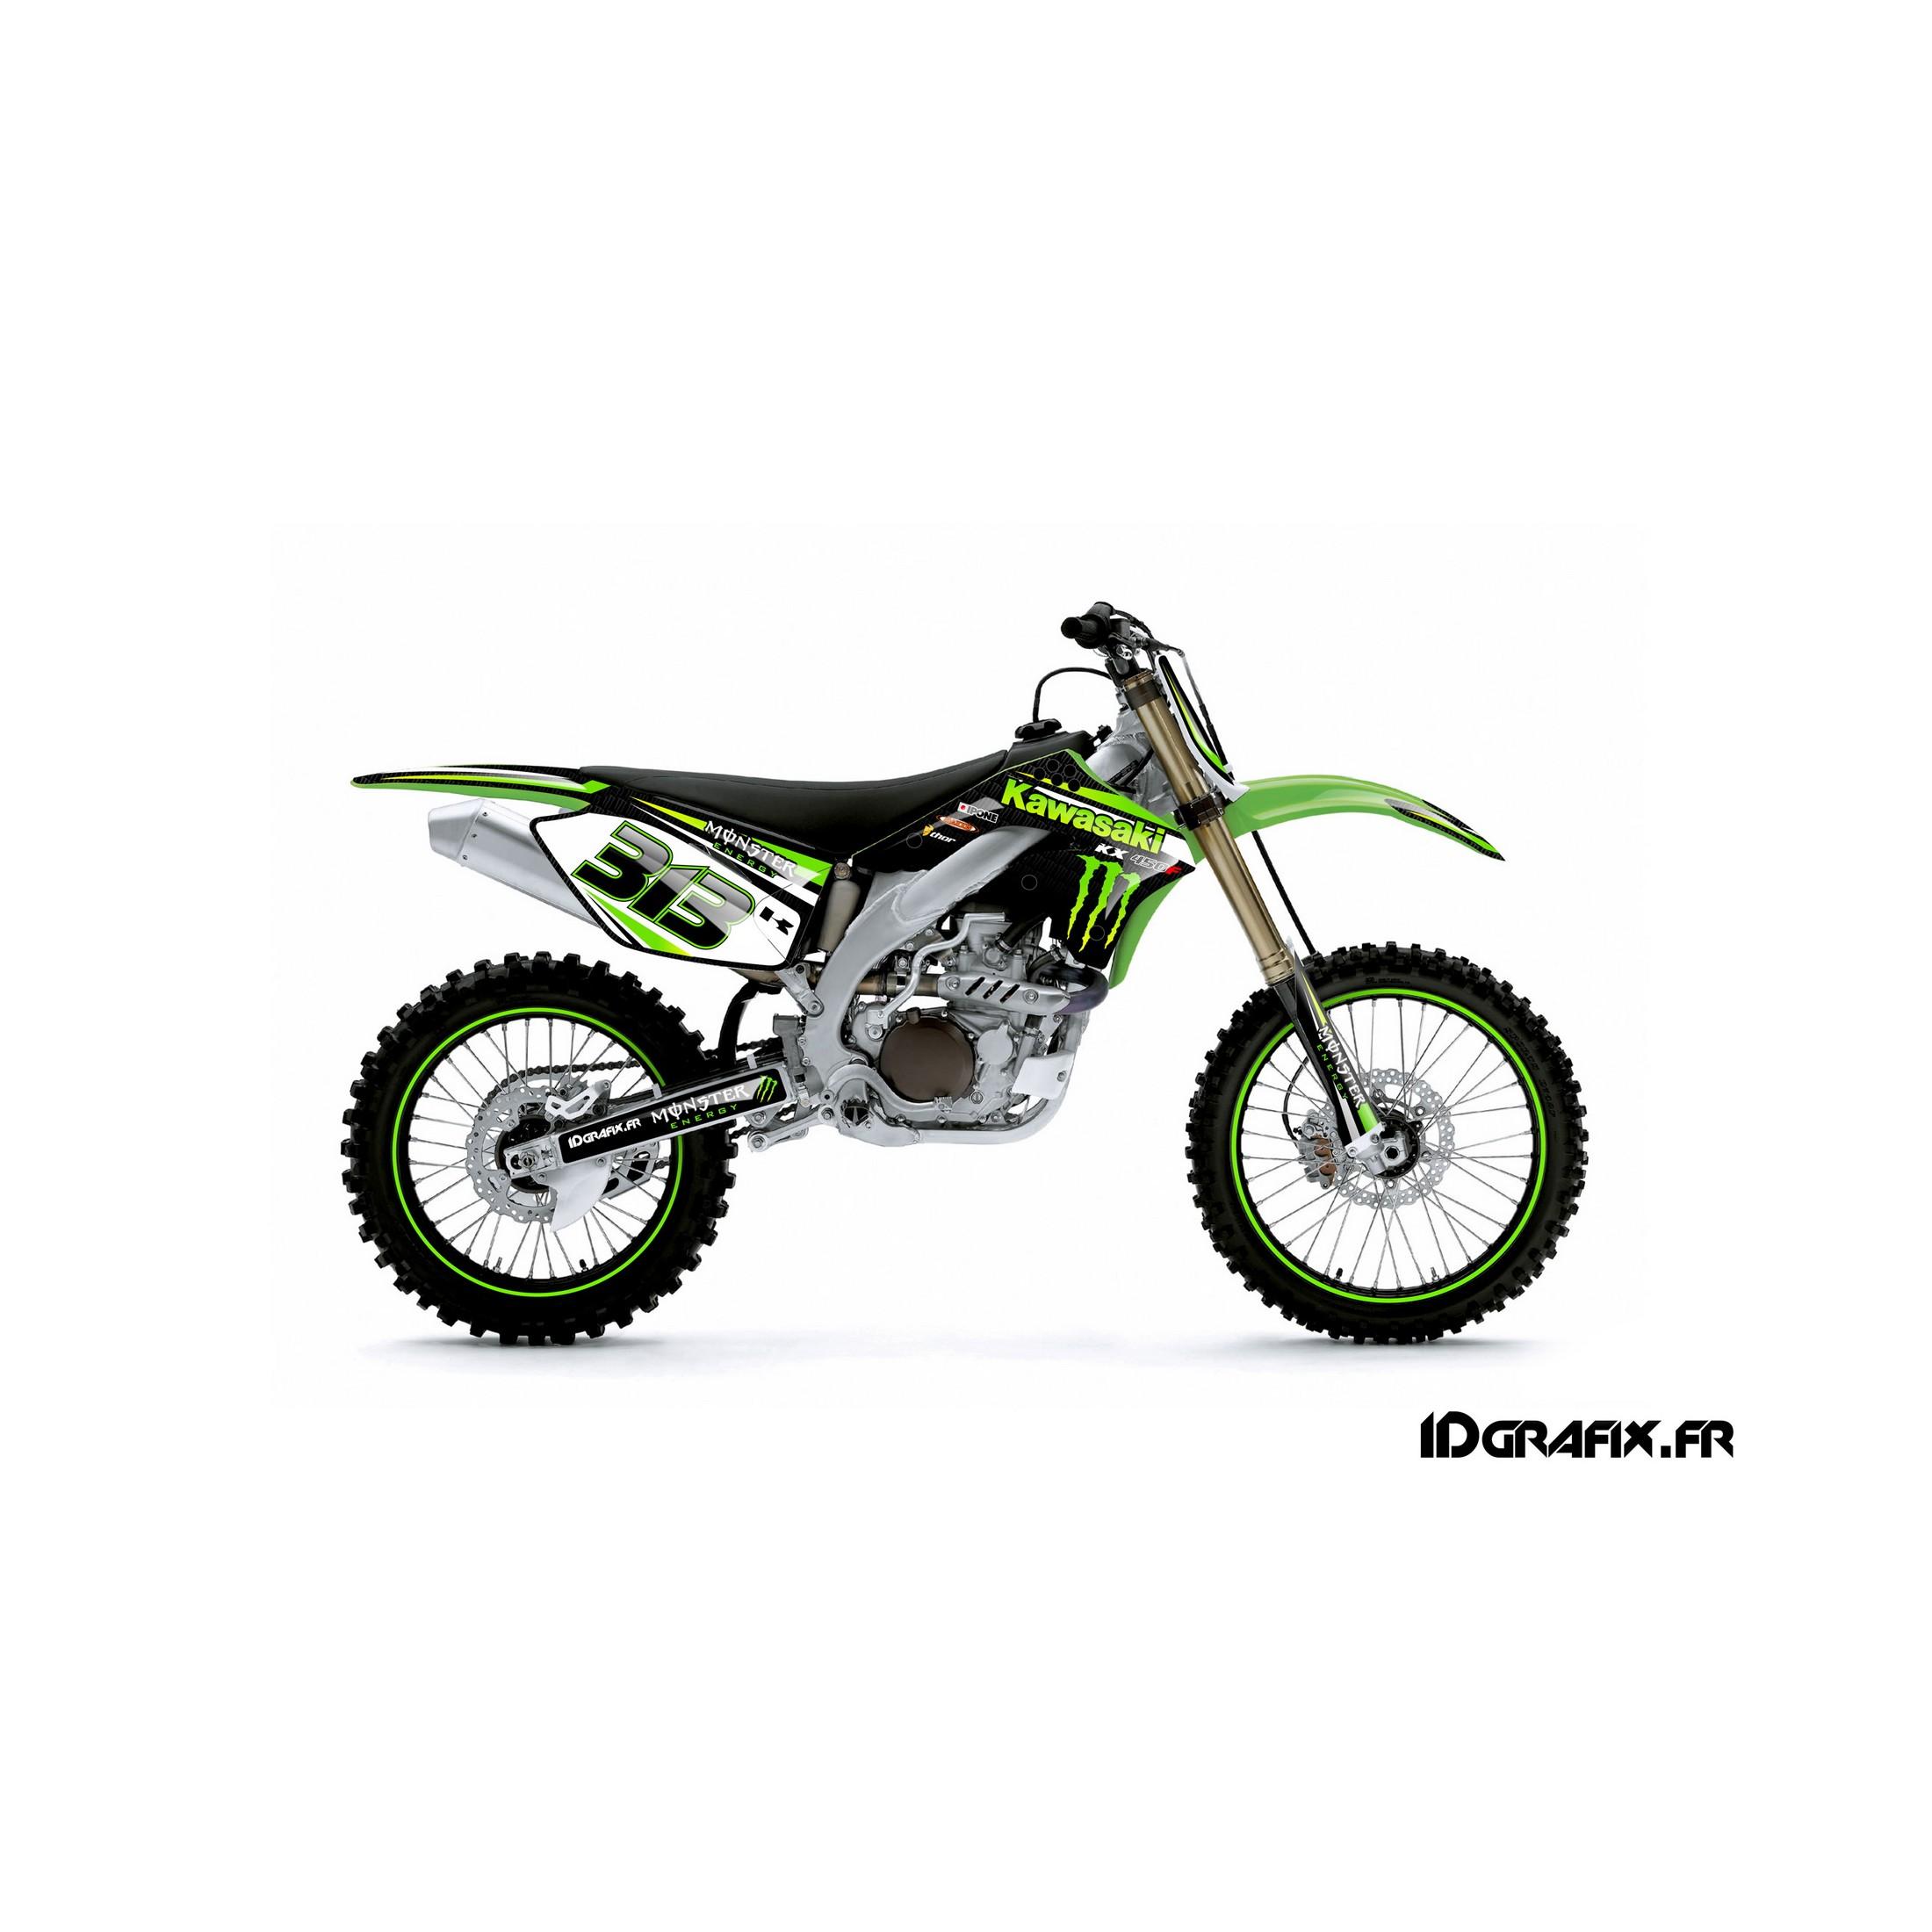 Kit déco Factory series pour Kawasaki KX450